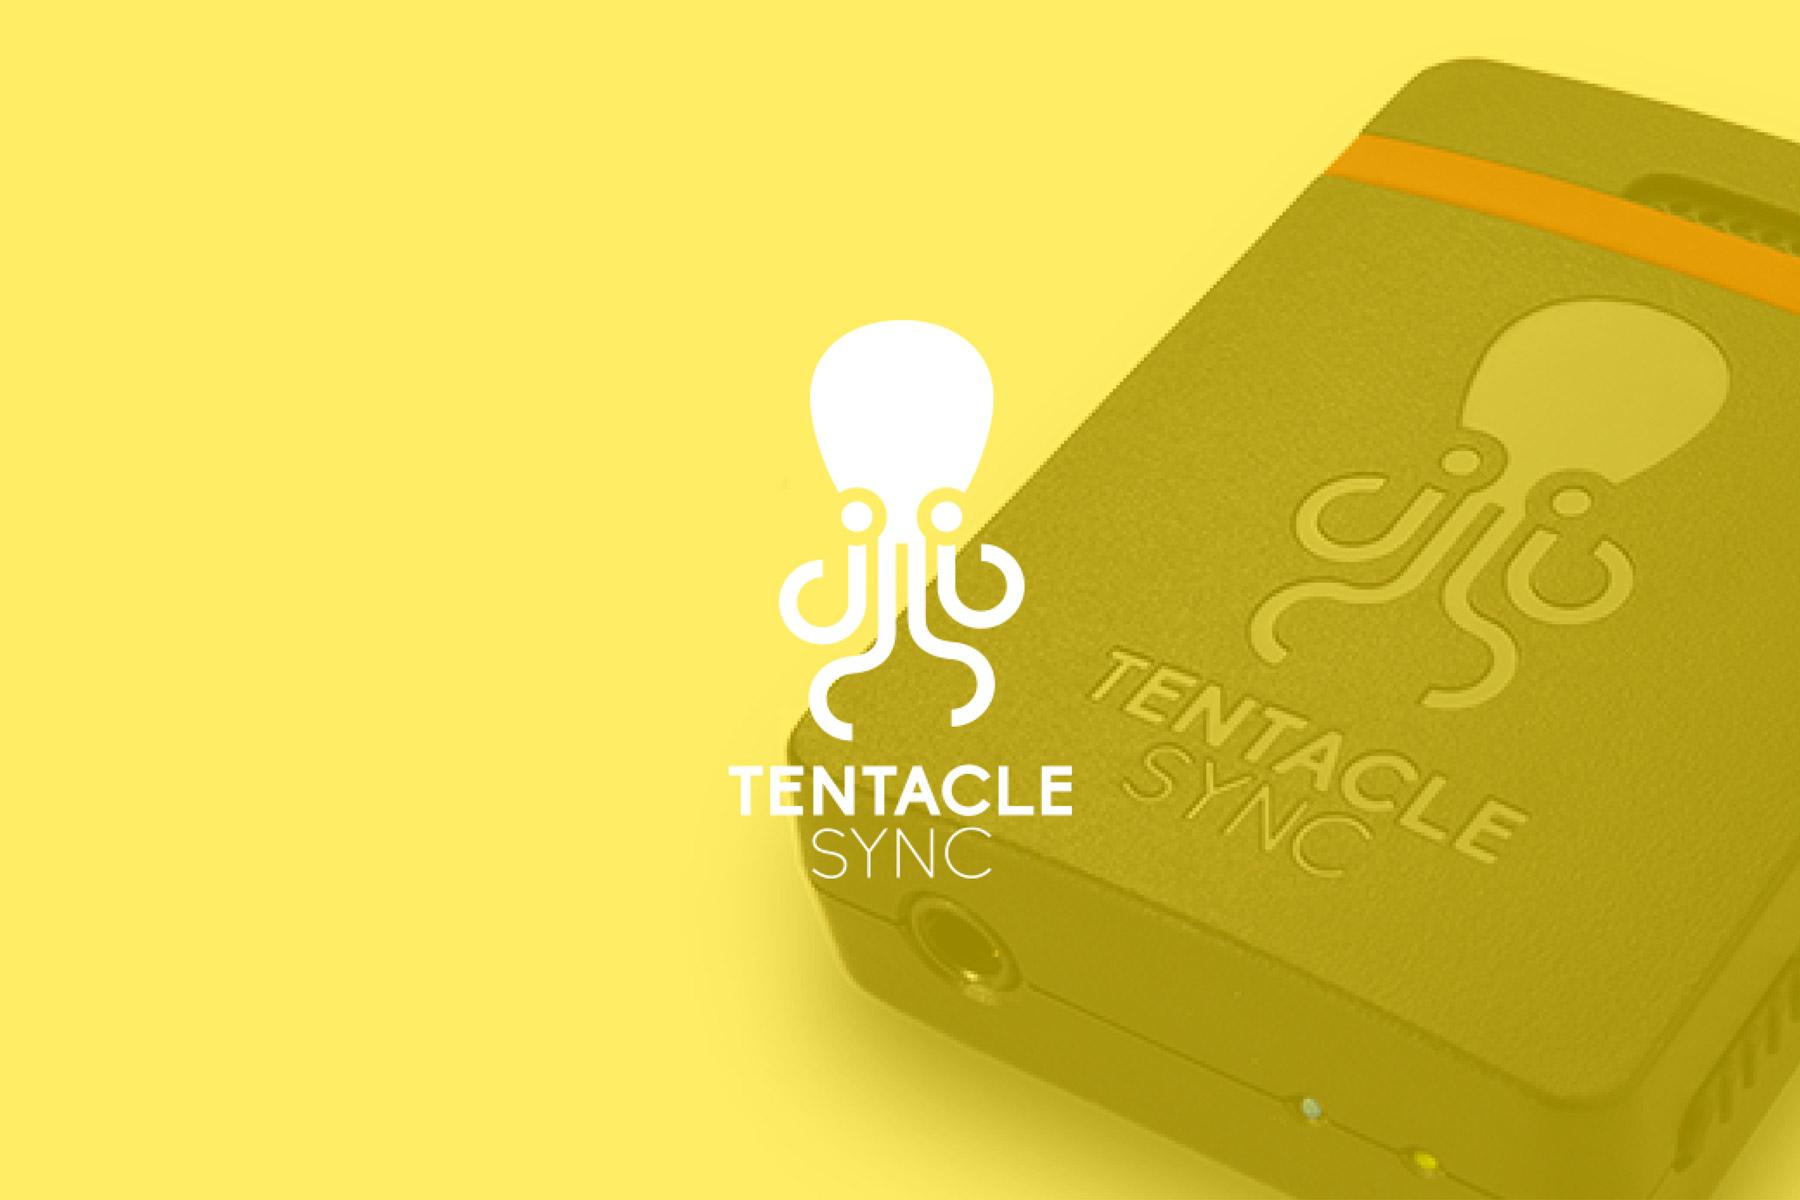 Neue Marken - Tentacle Sync